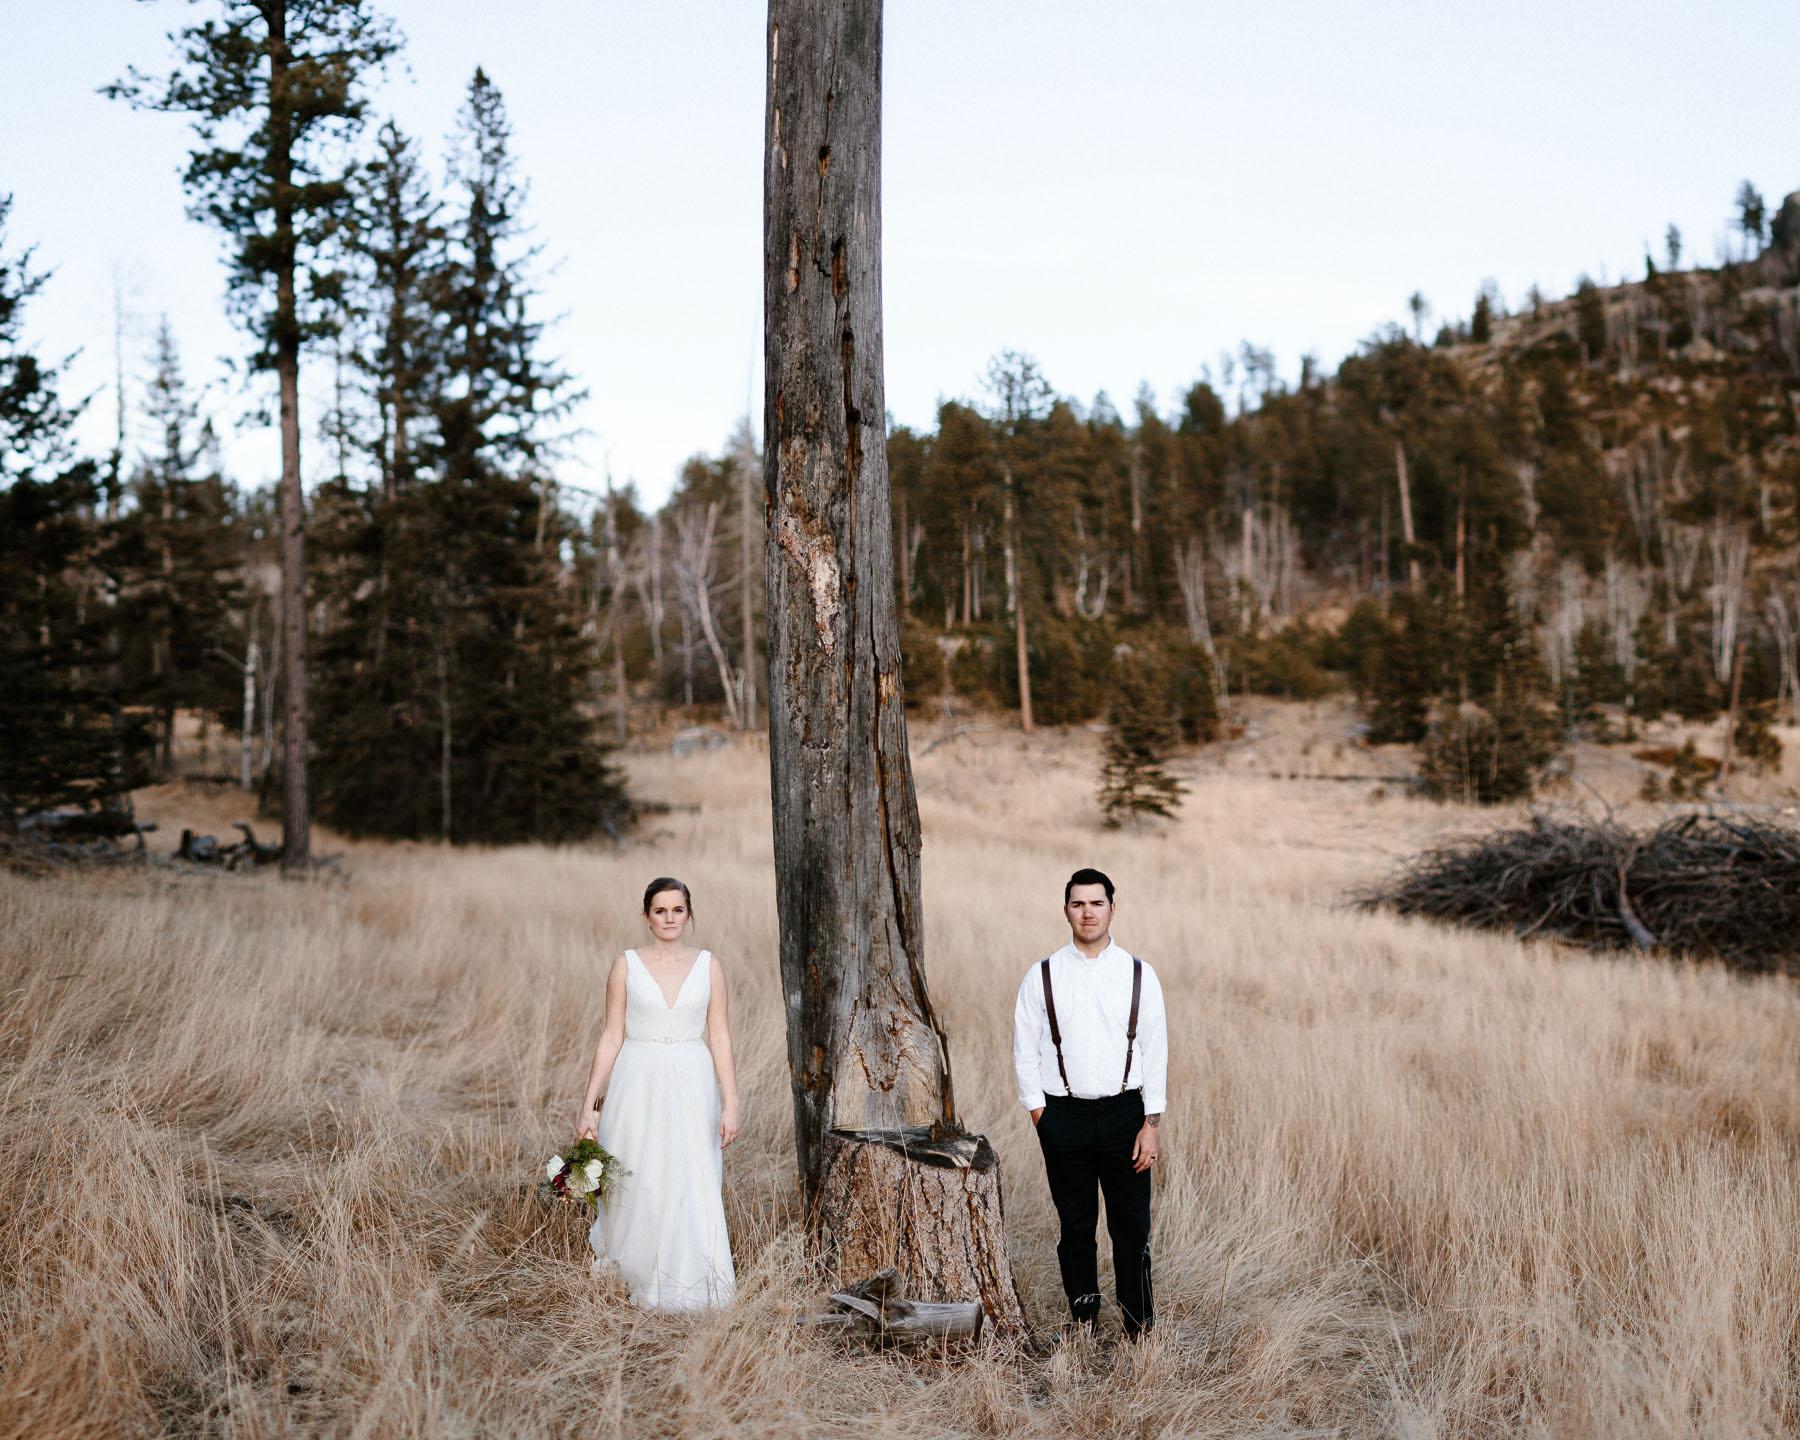 sioux-falls-black-hills-rapid-city-elopement-wedding-adventure-photographer-custer-sylvan-lake-39.jpg